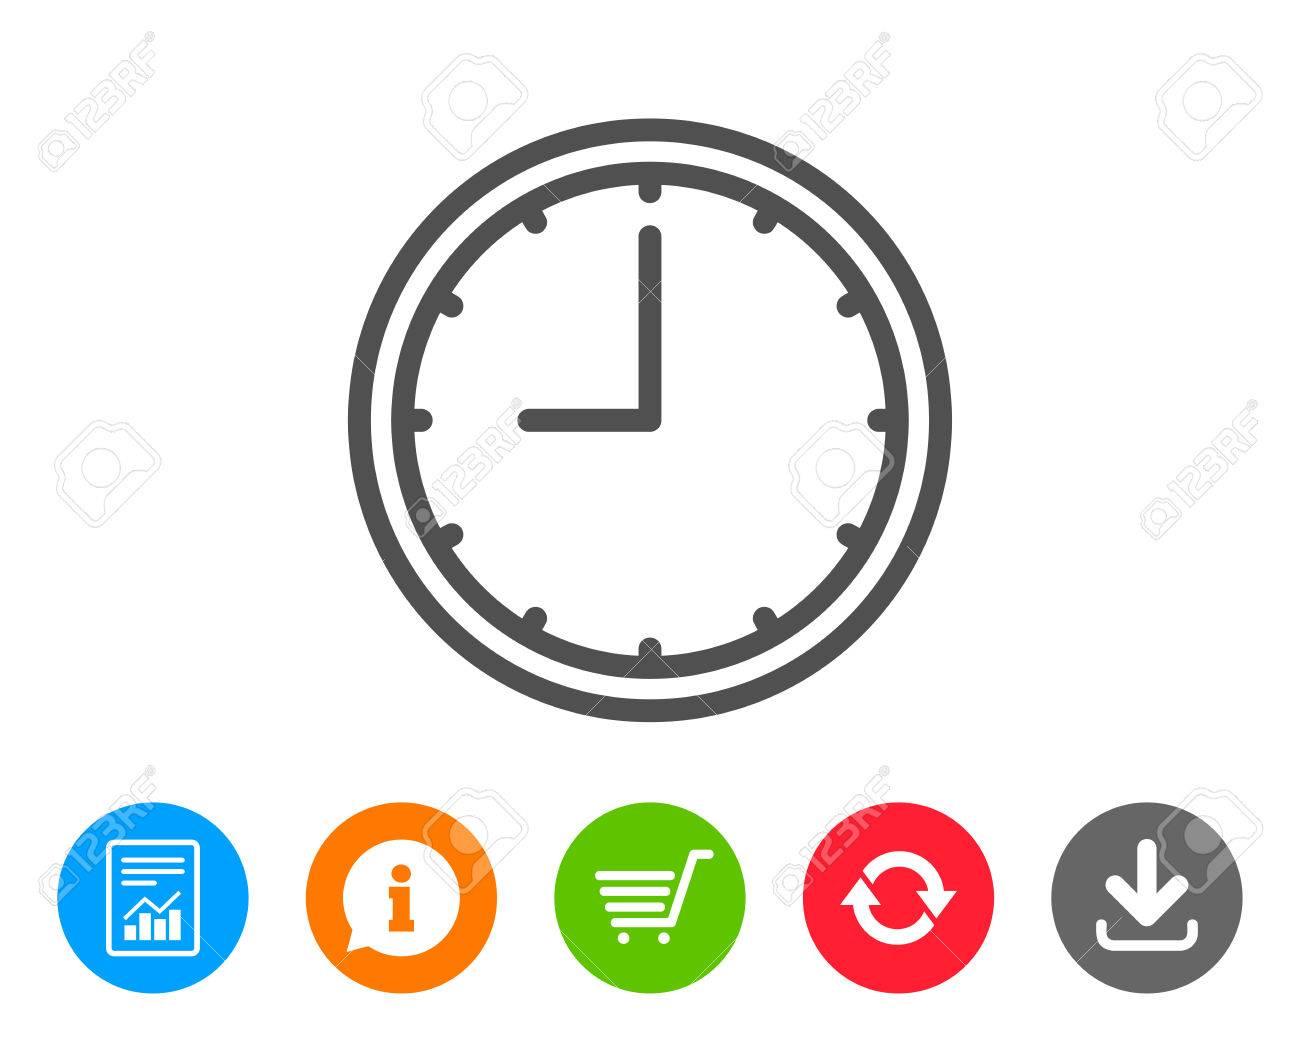 4b825c79d291 Icono De La Línea De Reloj Señal De Tiempo Reloj De Oficina O Símbolo De  Temporizador. Informe